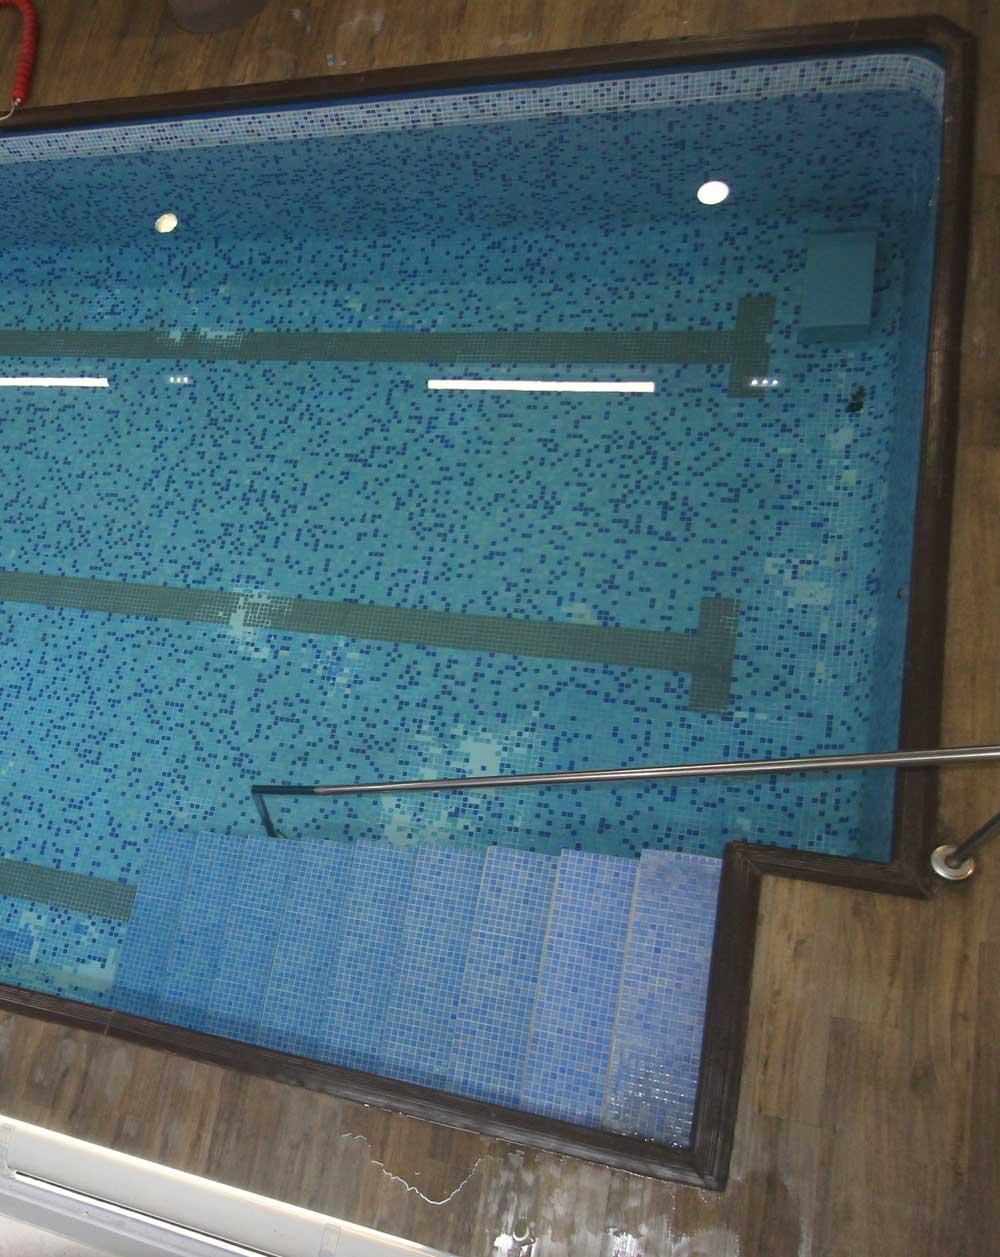 colegio-mayor-universsitario-zaragoza-piscina-1